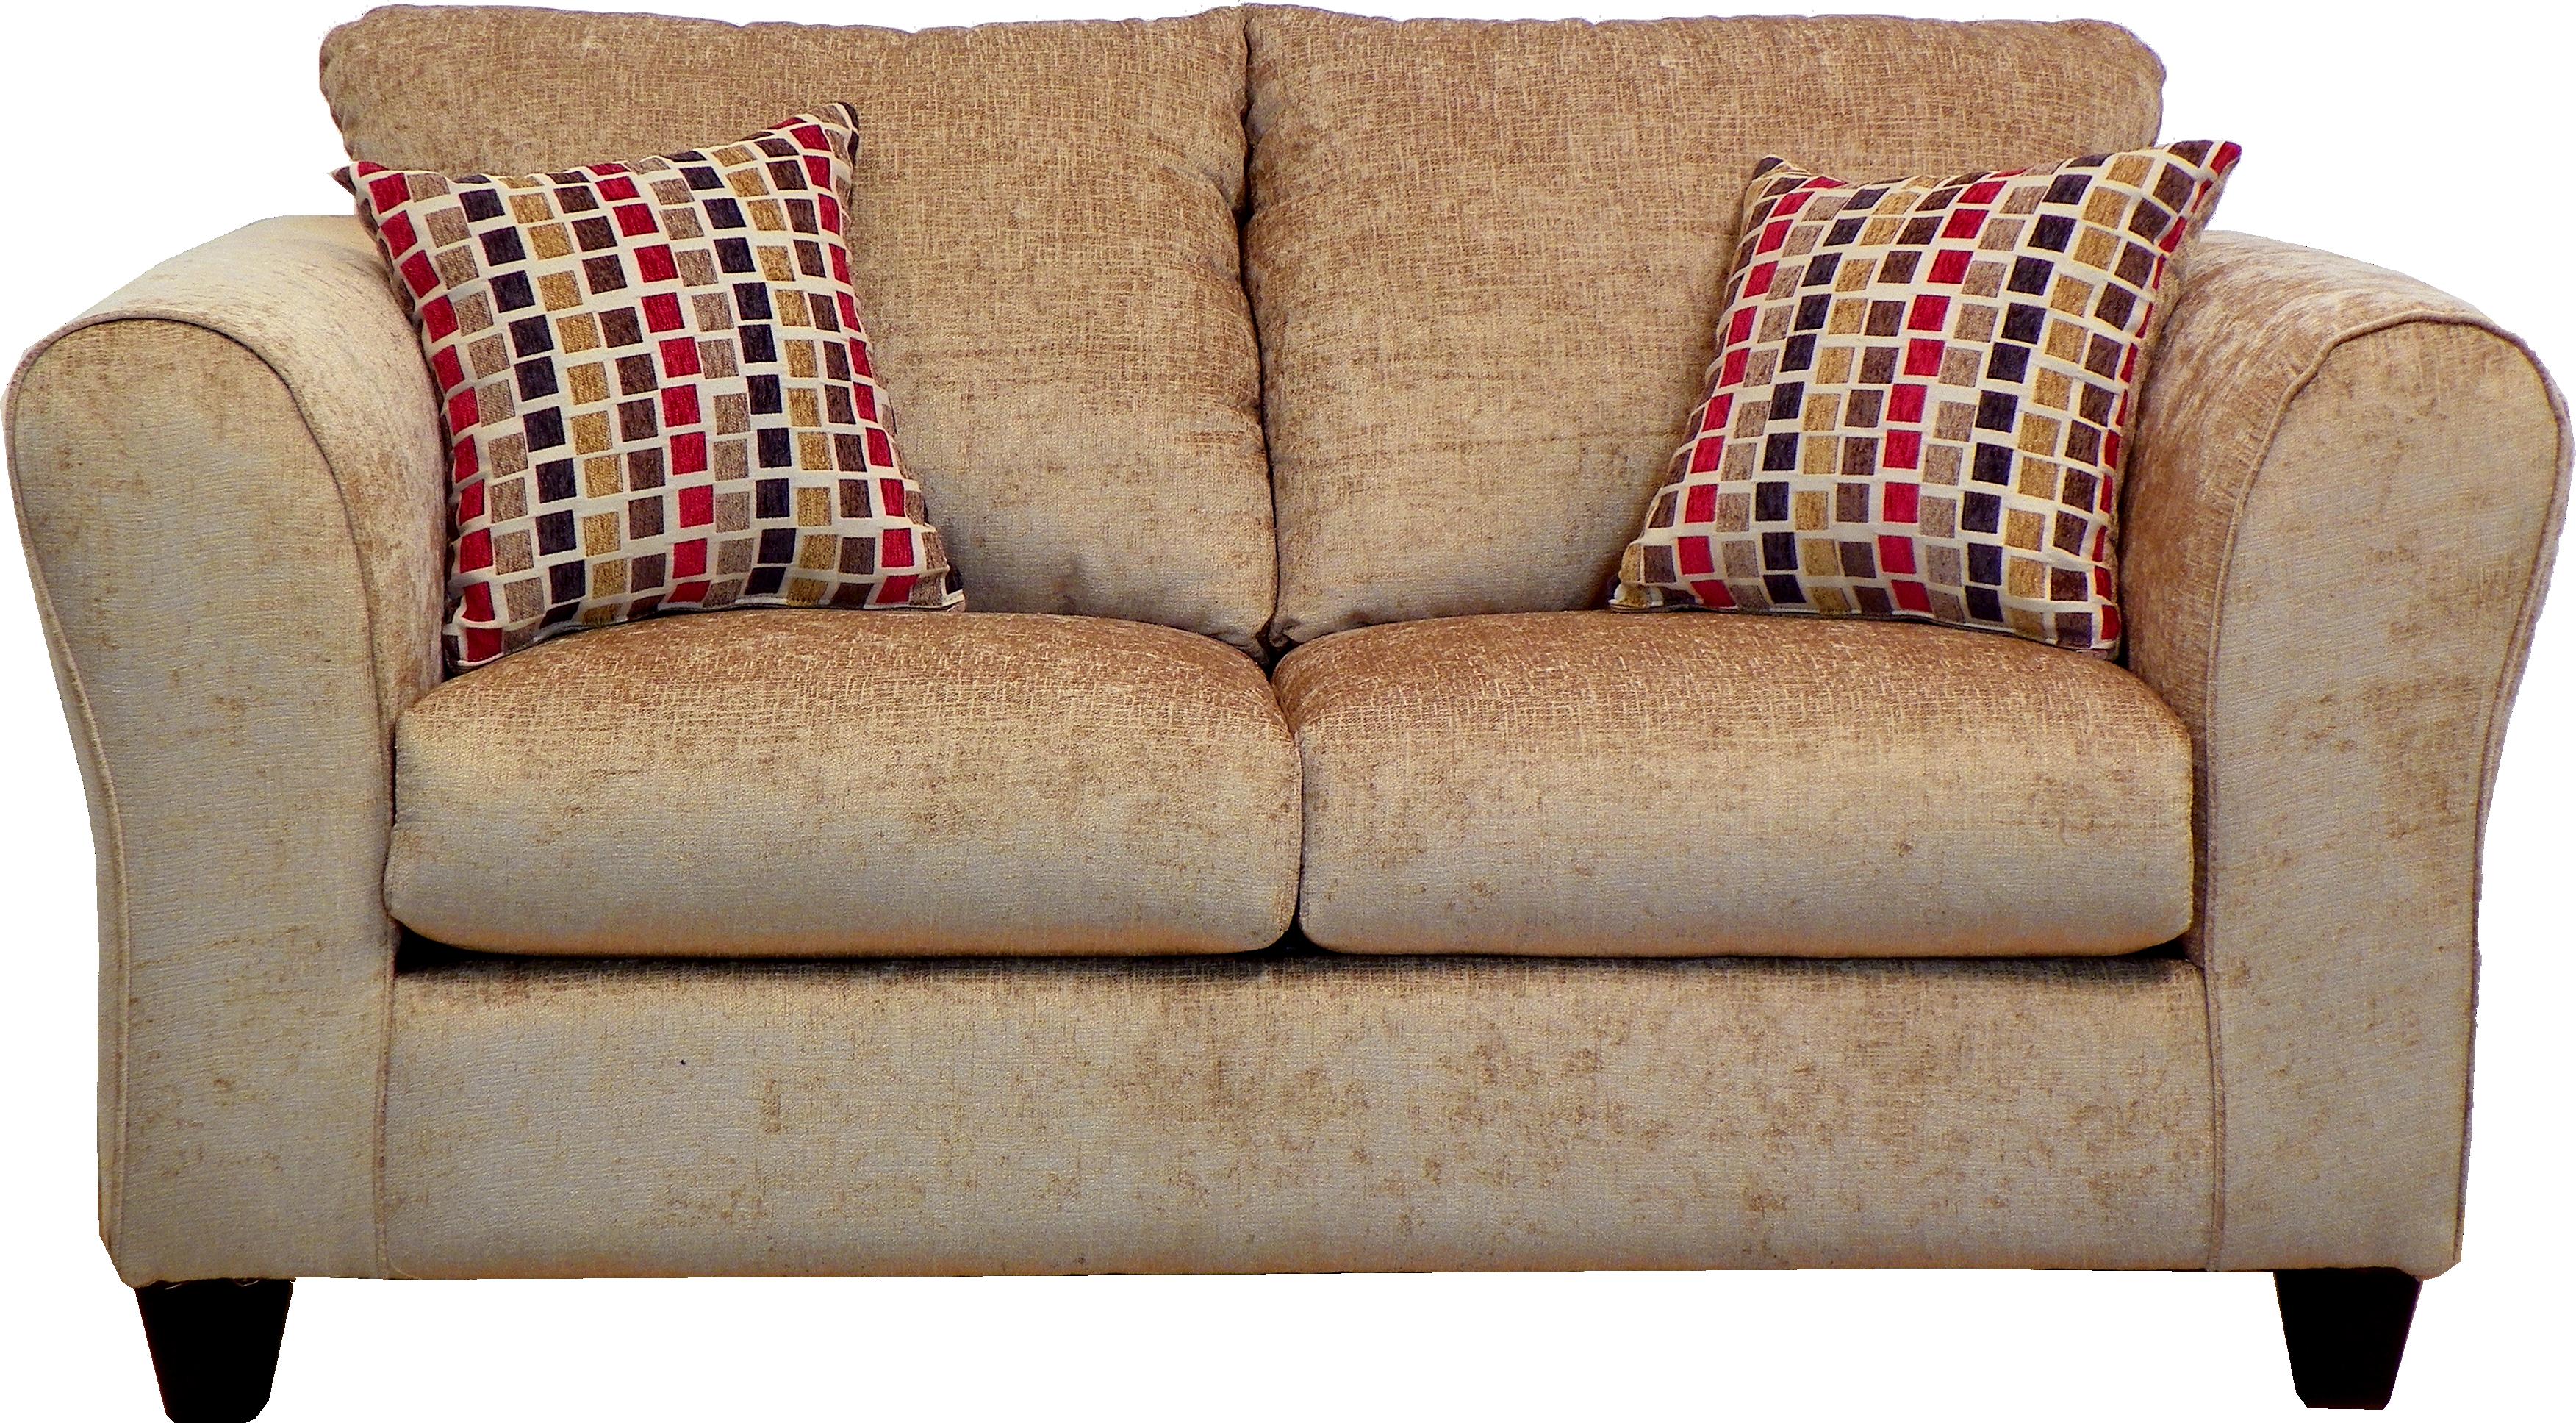 Sofa HD PNG - 118098